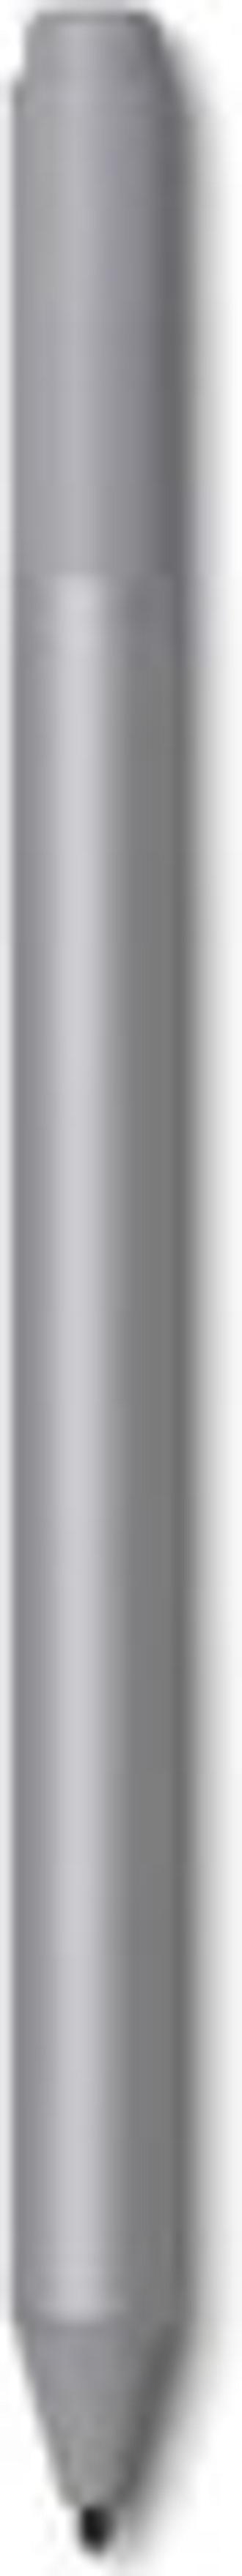 Microsoft Surface Pen - Platinum